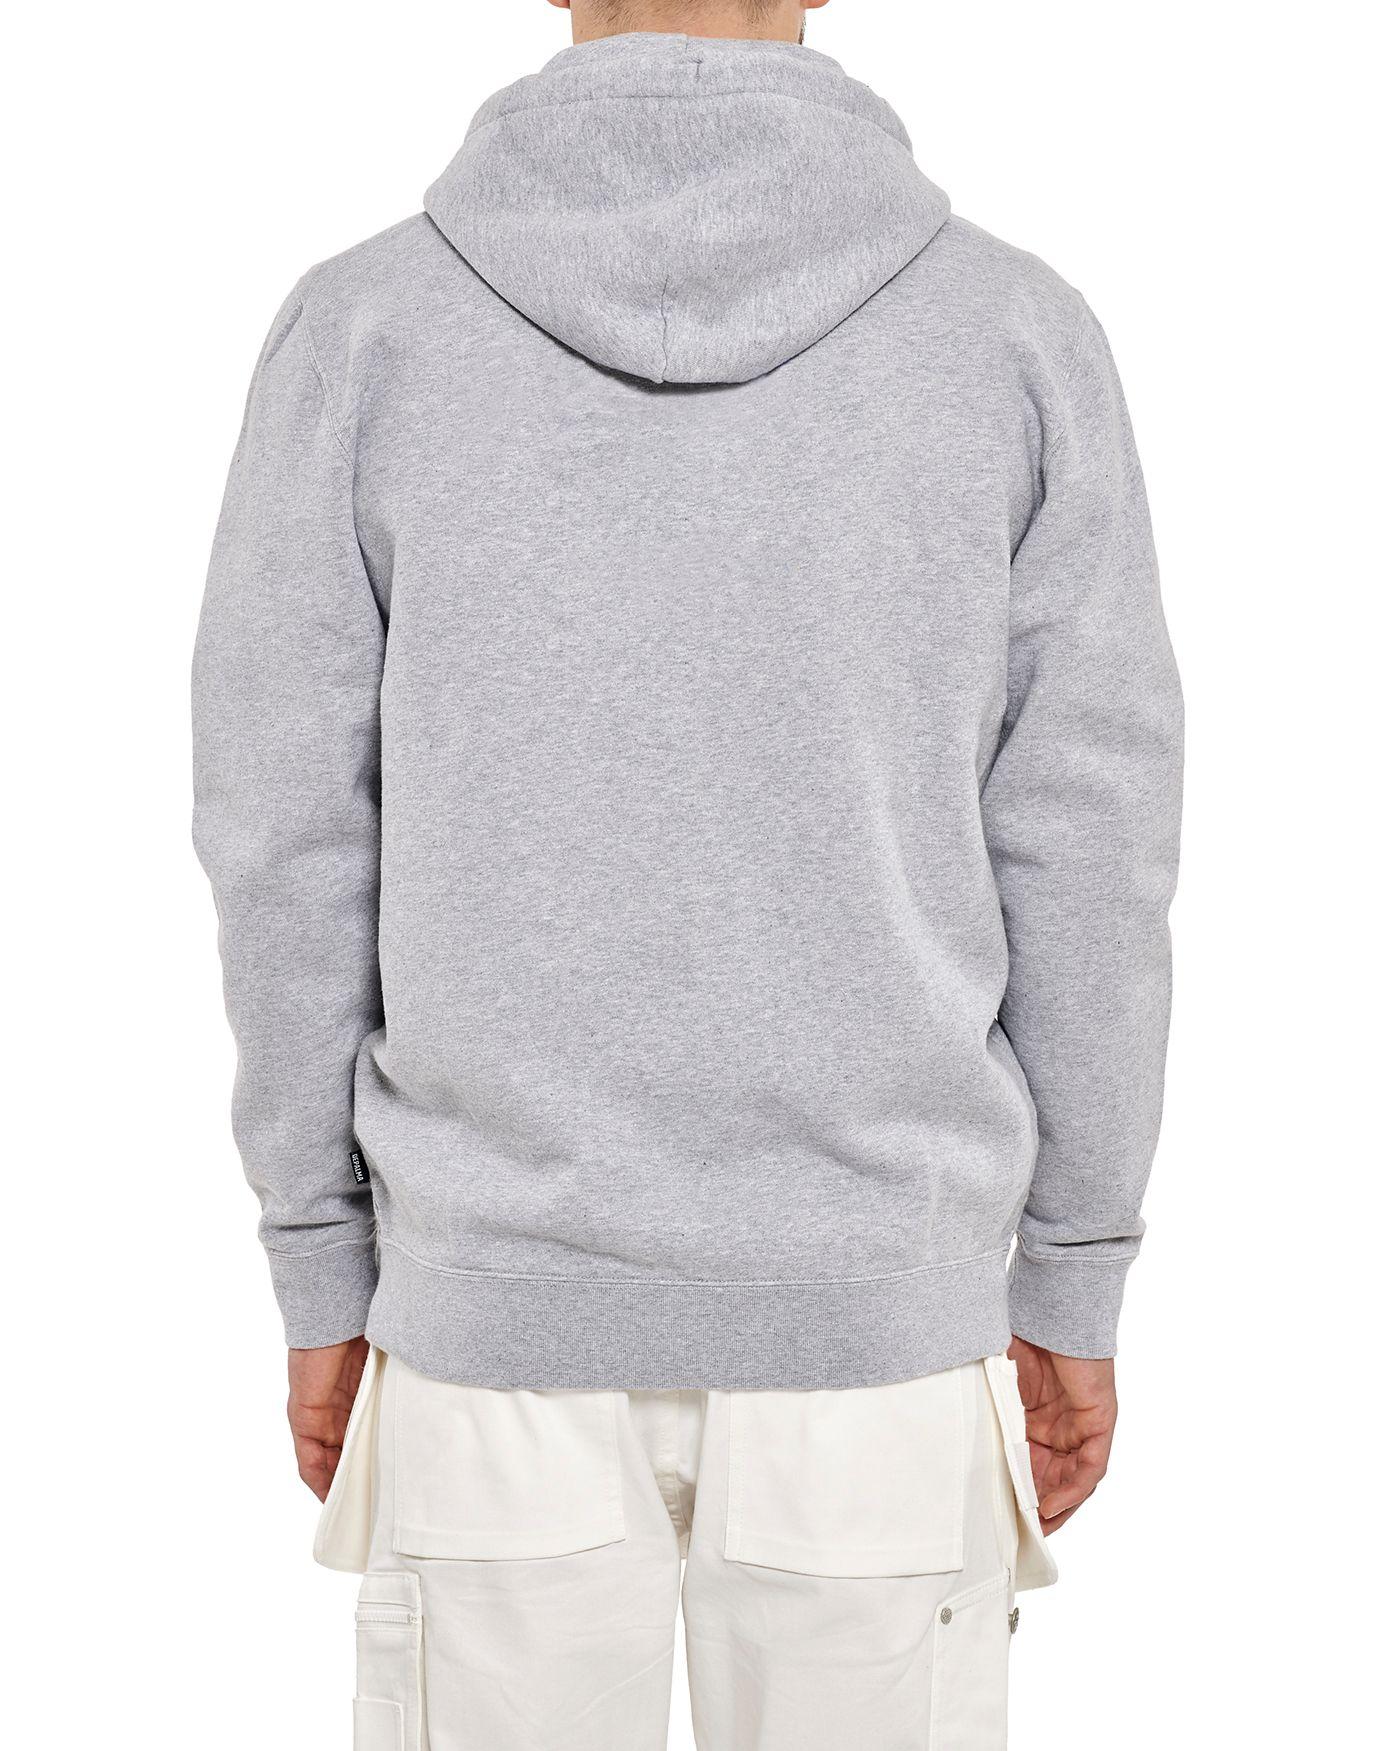 Photo of Alcro Zip Hooded Sweatshirt Zip Hooded Sweatshirt, Grey Melange